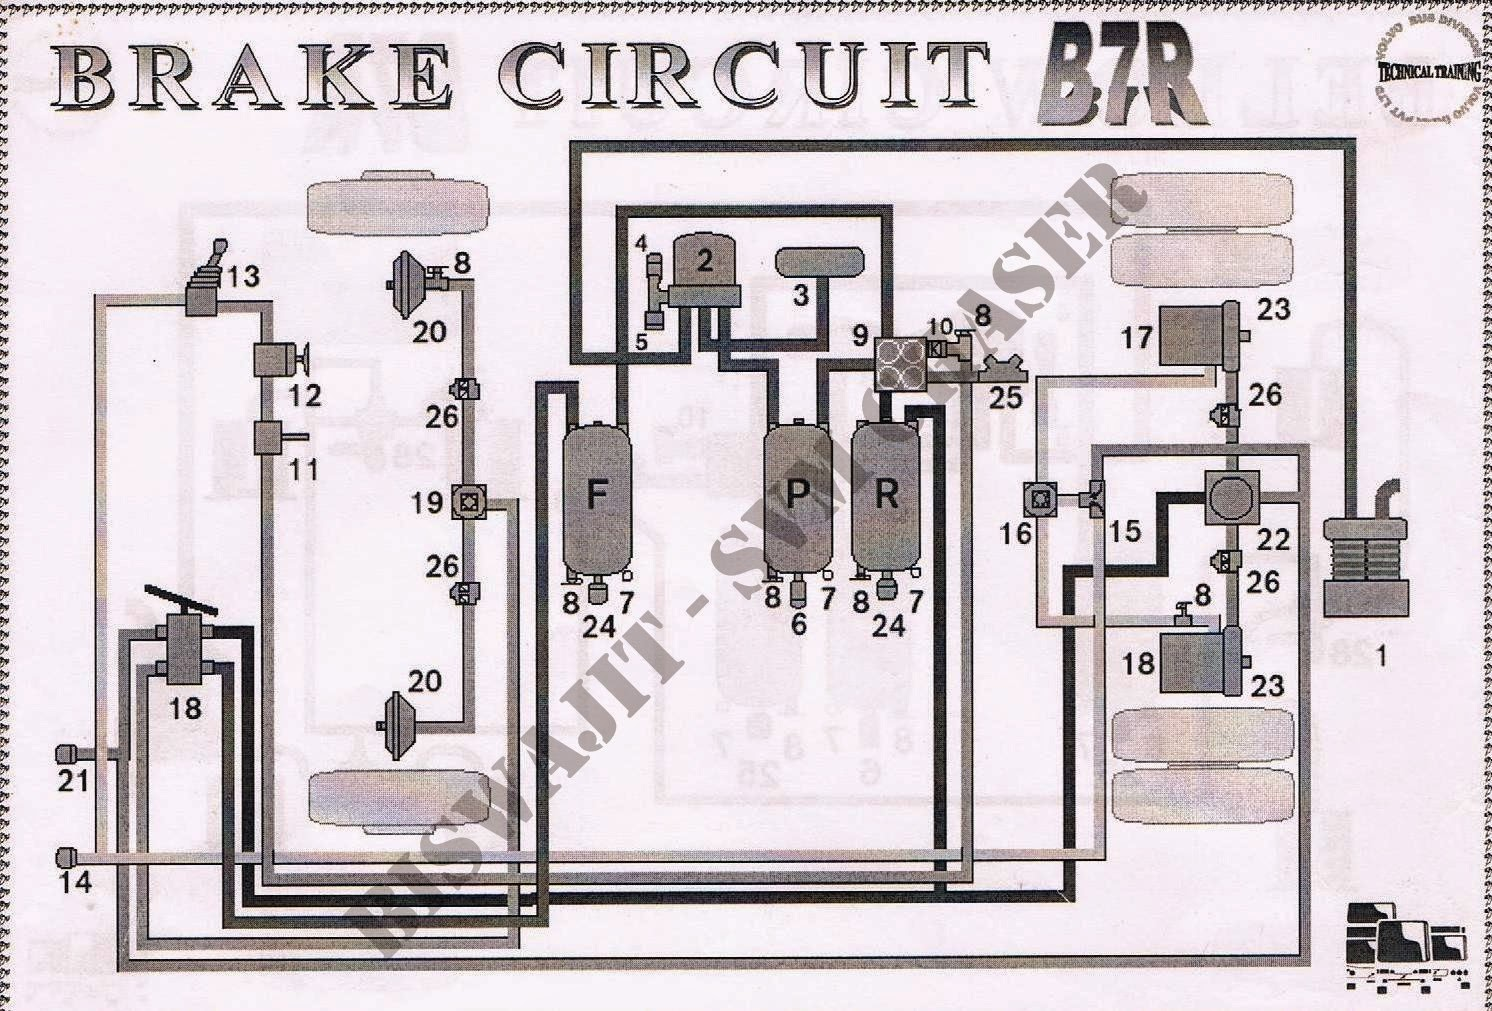 relay for 2008 jeep wrangler heater 2000 wrangler heater relay wiring diagram  [ 1492 x 1011 Pixel ]